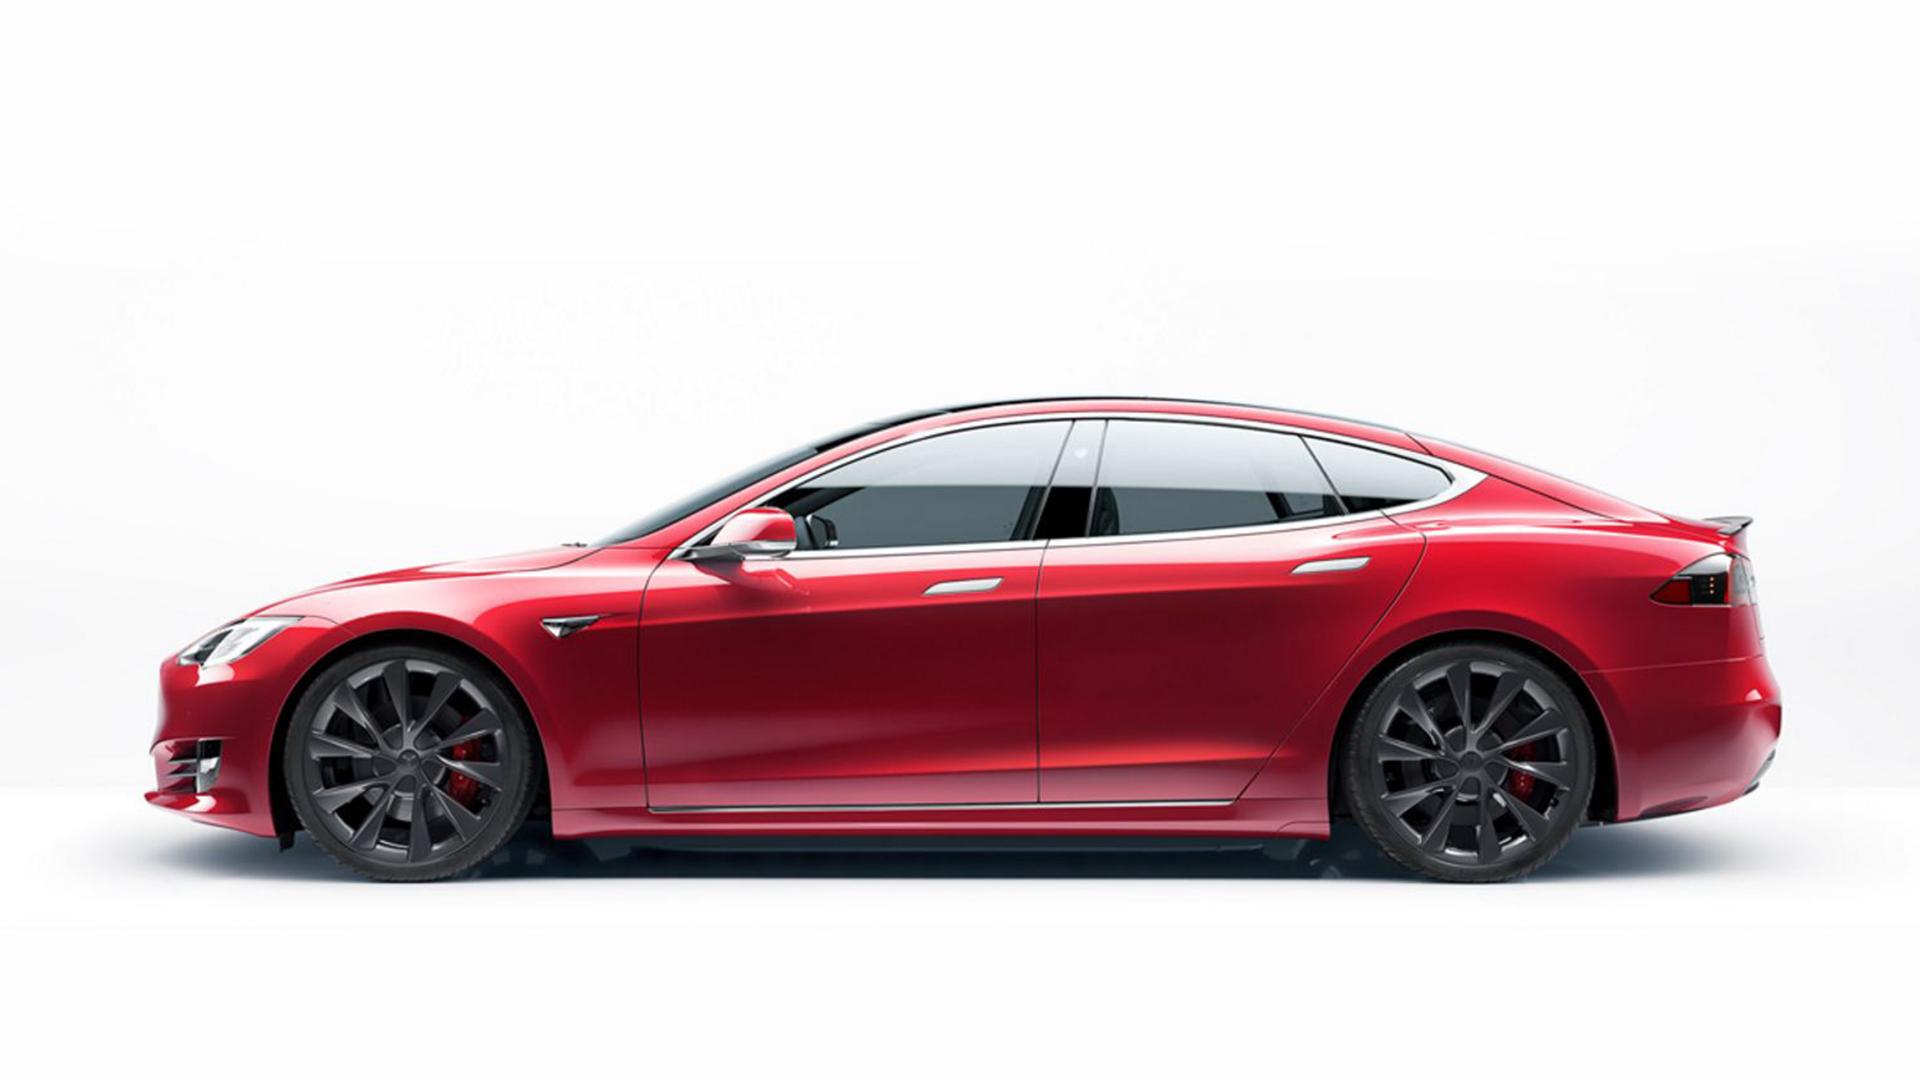 Tesla Model S 2018 P100D - Price, Mileage, Reviews